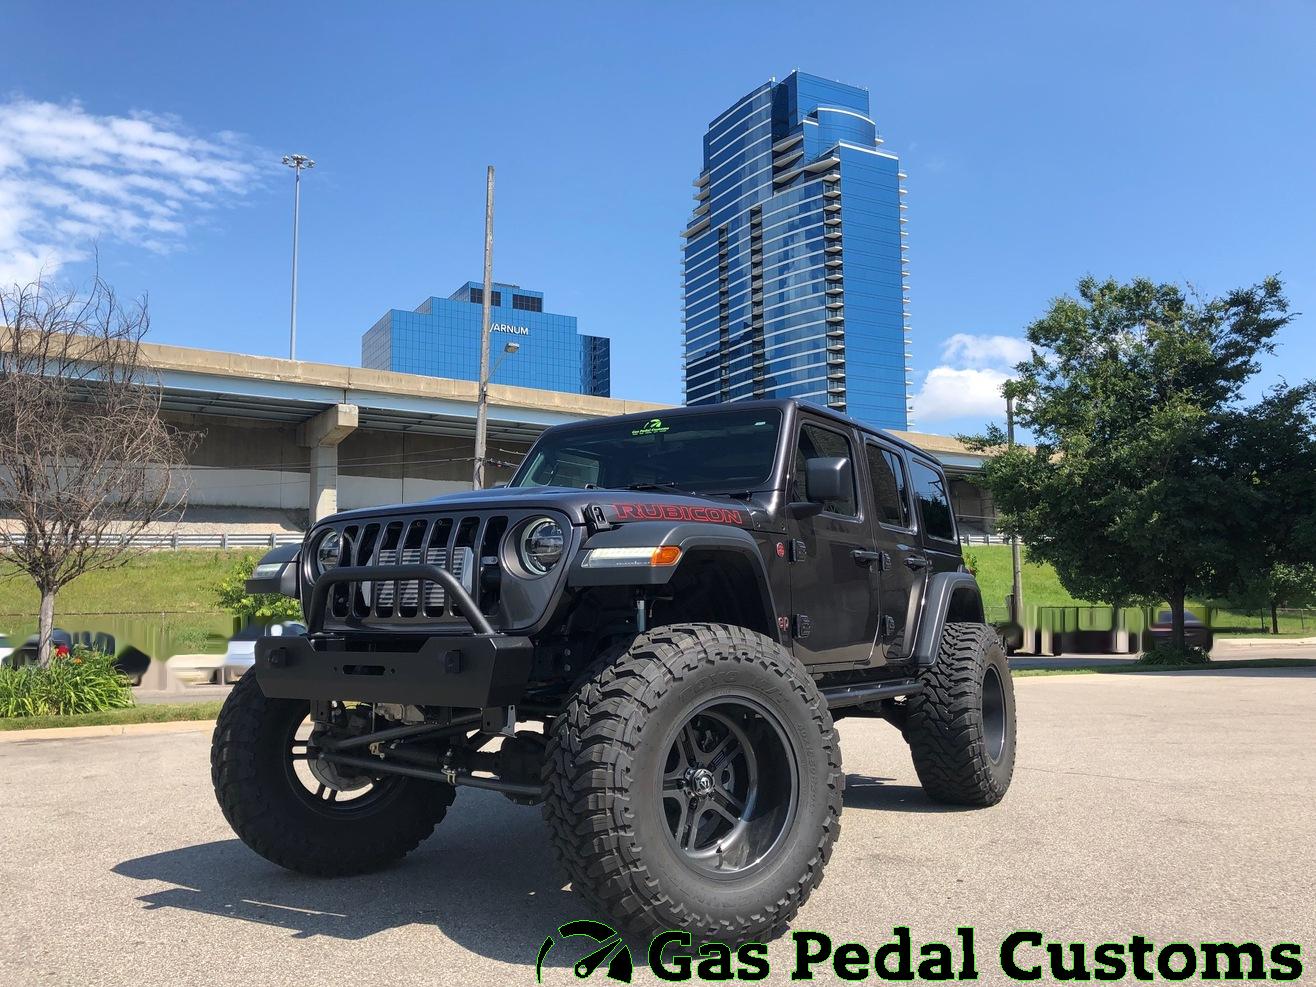 2018 Jeep Wrangler Rubicon With Prodigy Turbo Clayton Offroad